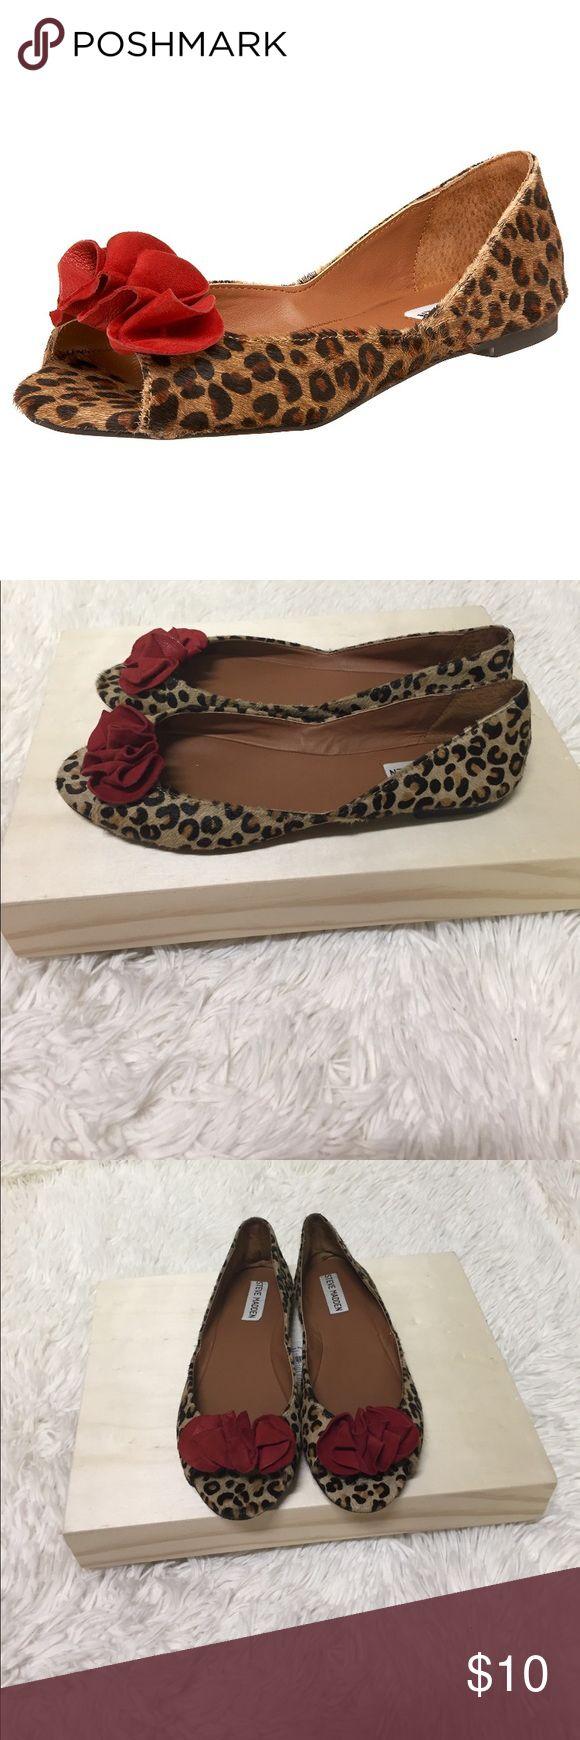 Steve Madden Floralel Leopard Ballet Flats Sz 8.5 Steve Madden Floralel Leopard Pony Hair Ballet Flats Size 8.5. The do have some wear on the inside and back of left shoe. Steve Madden Shoes Flats & Loafers